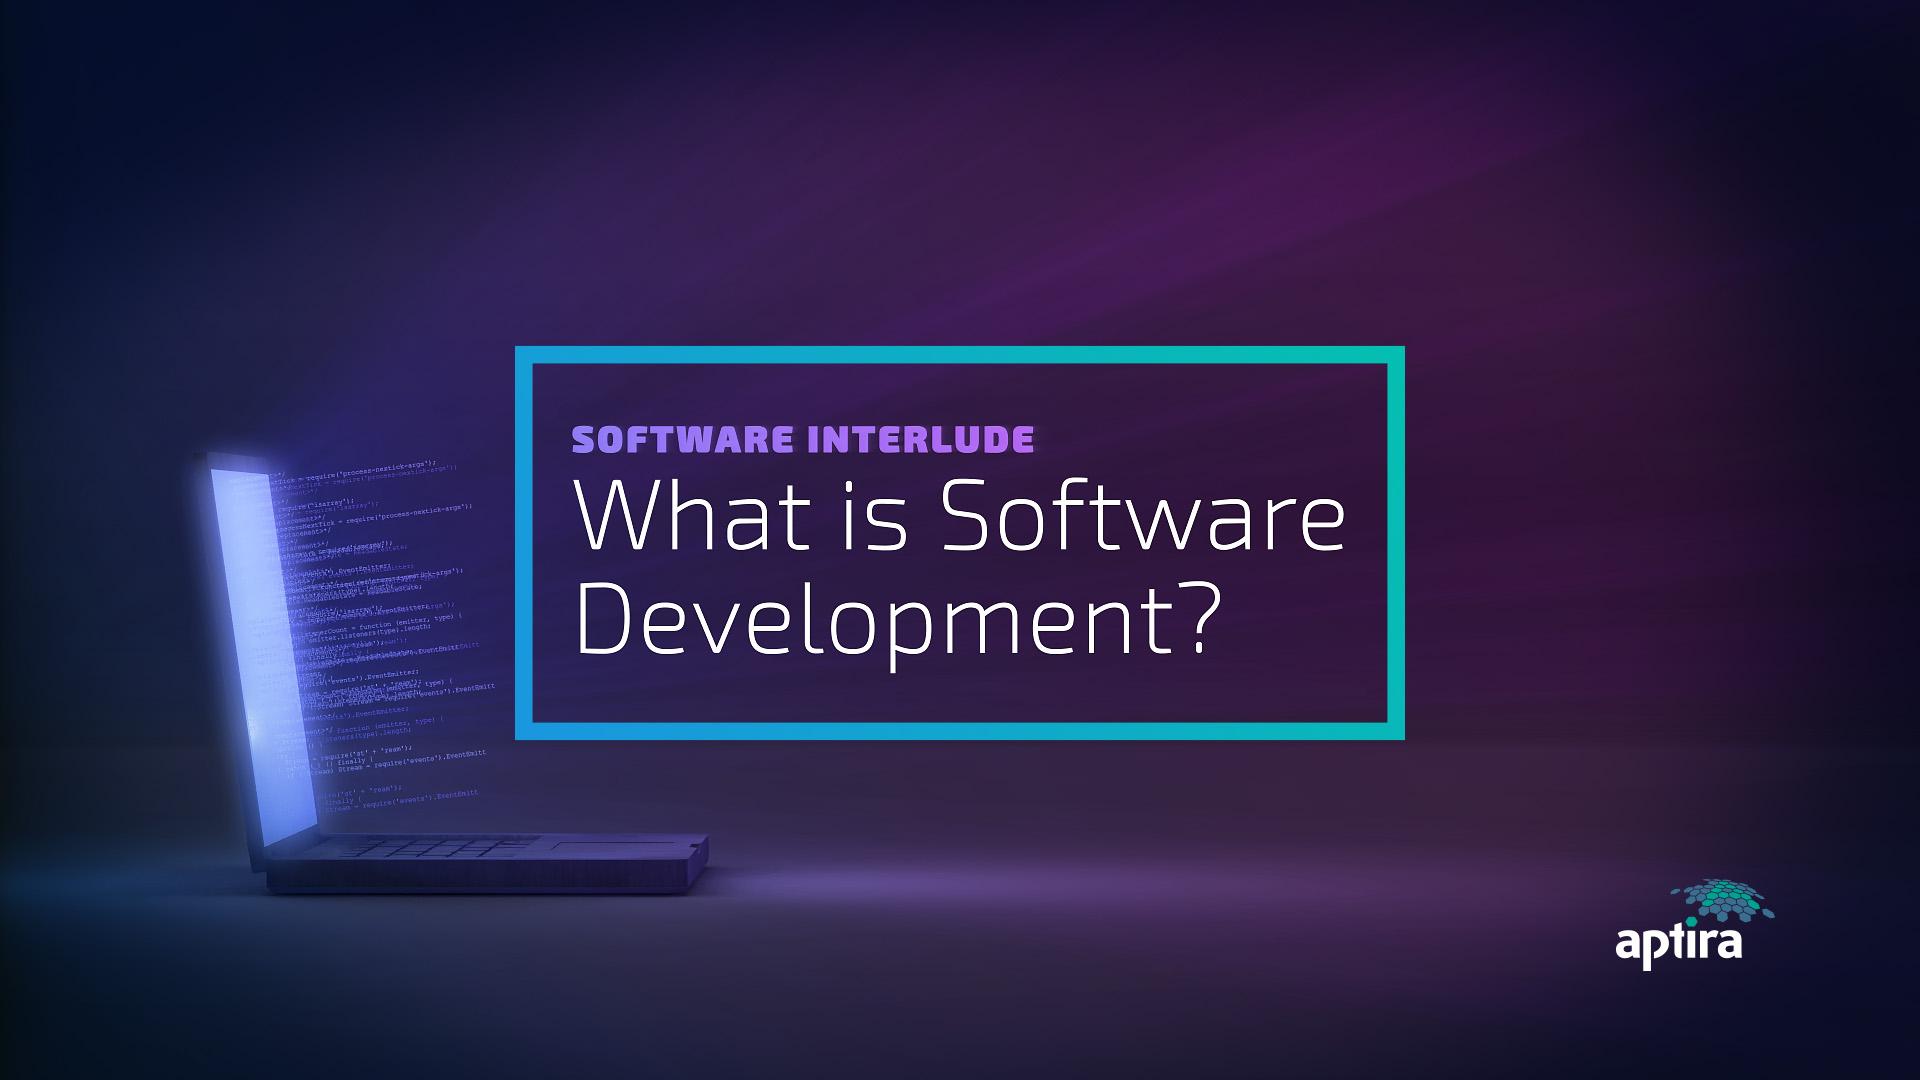 Aptira Software Interlude - What is Software Development?